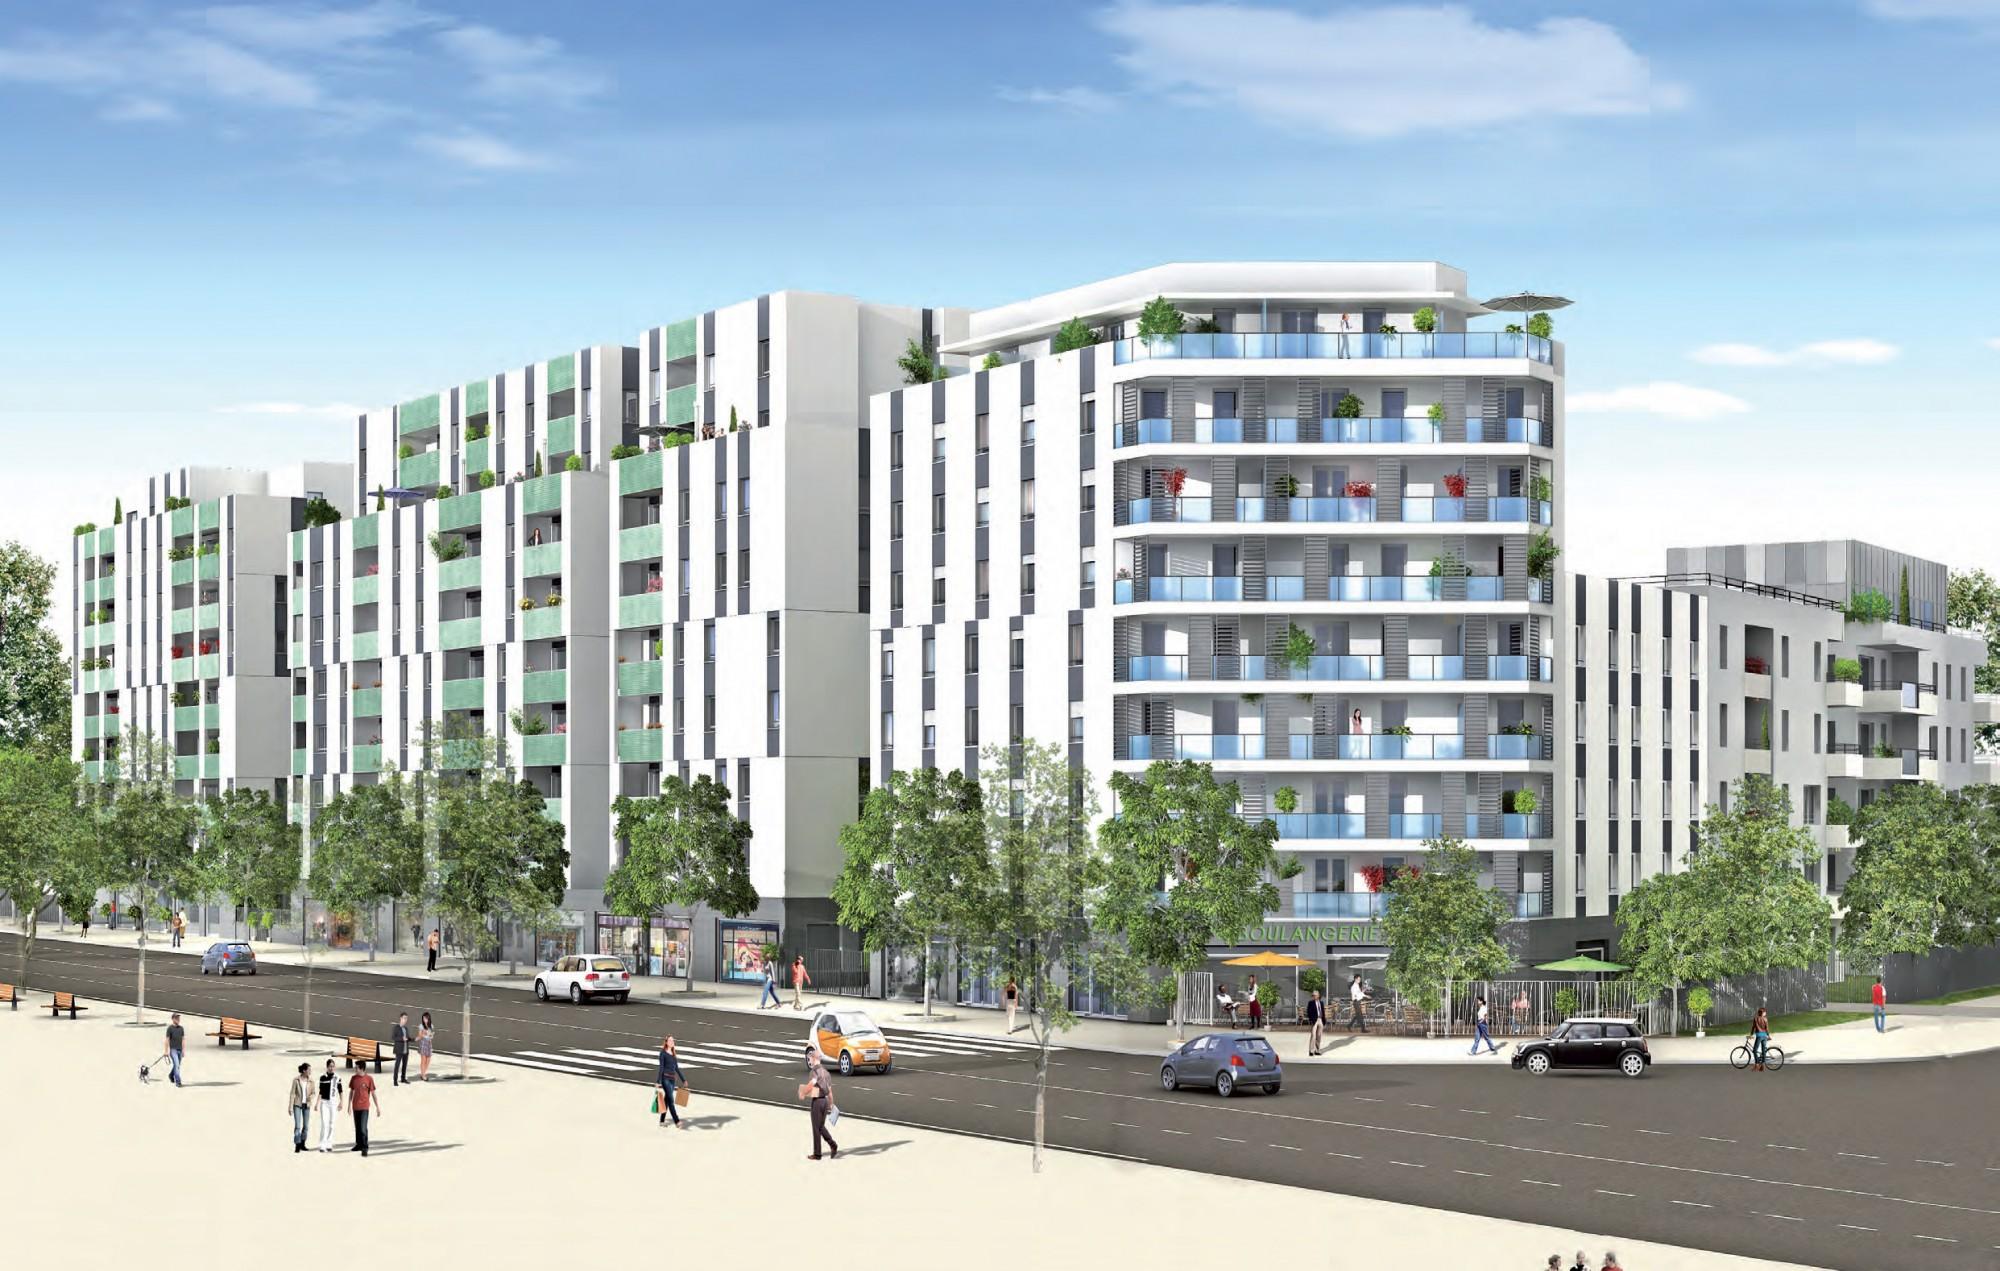 programme pinel lyon 8 livrable 2015 programmes neufs programme immobilier neuf lyon mca. Black Bedroom Furniture Sets. Home Design Ideas